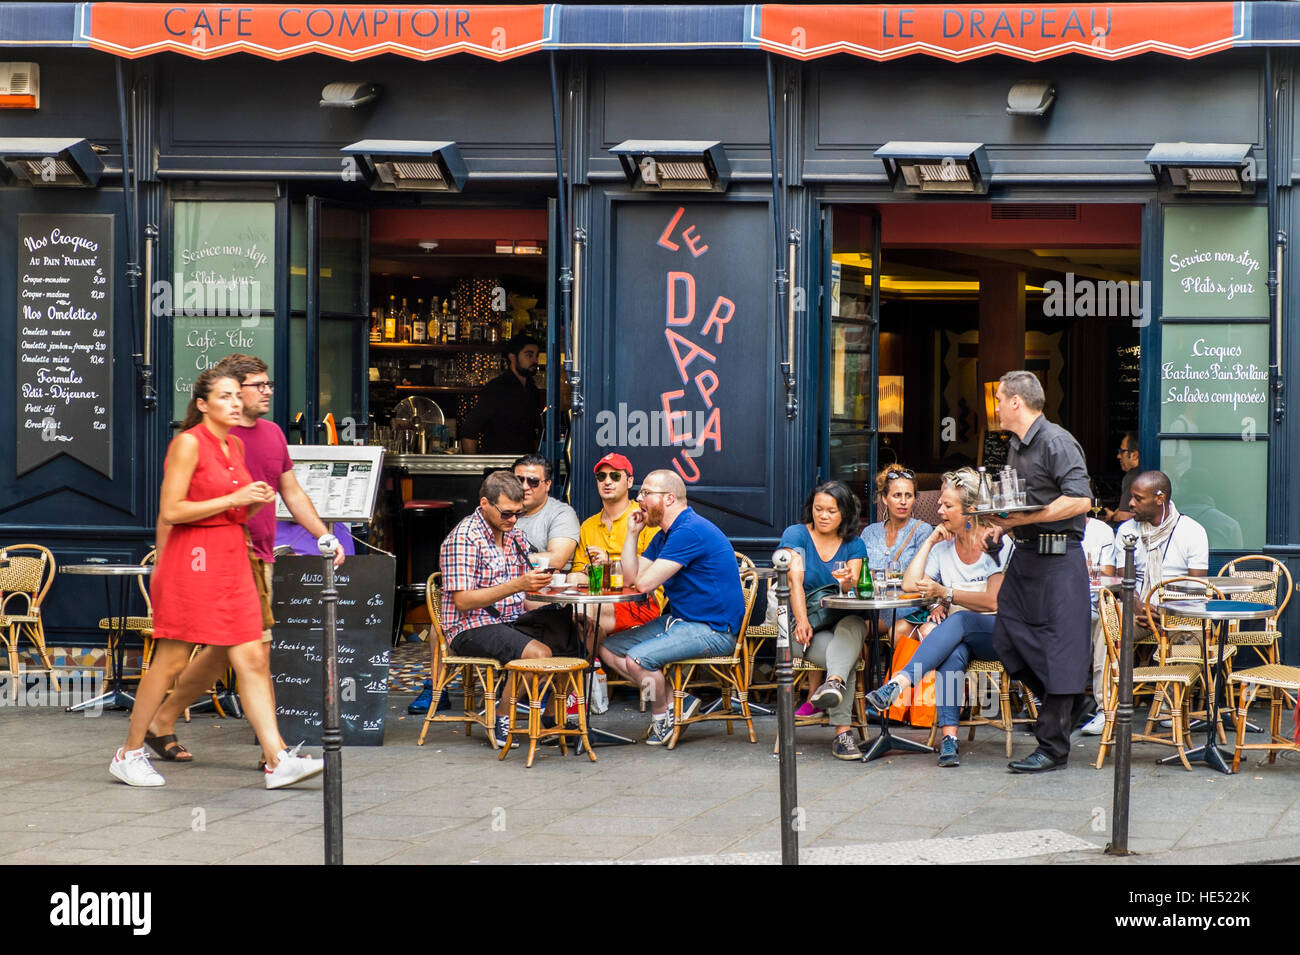 https www alamy com stock photo street scene in front of le drapeau cafe comptoir 129189163 html